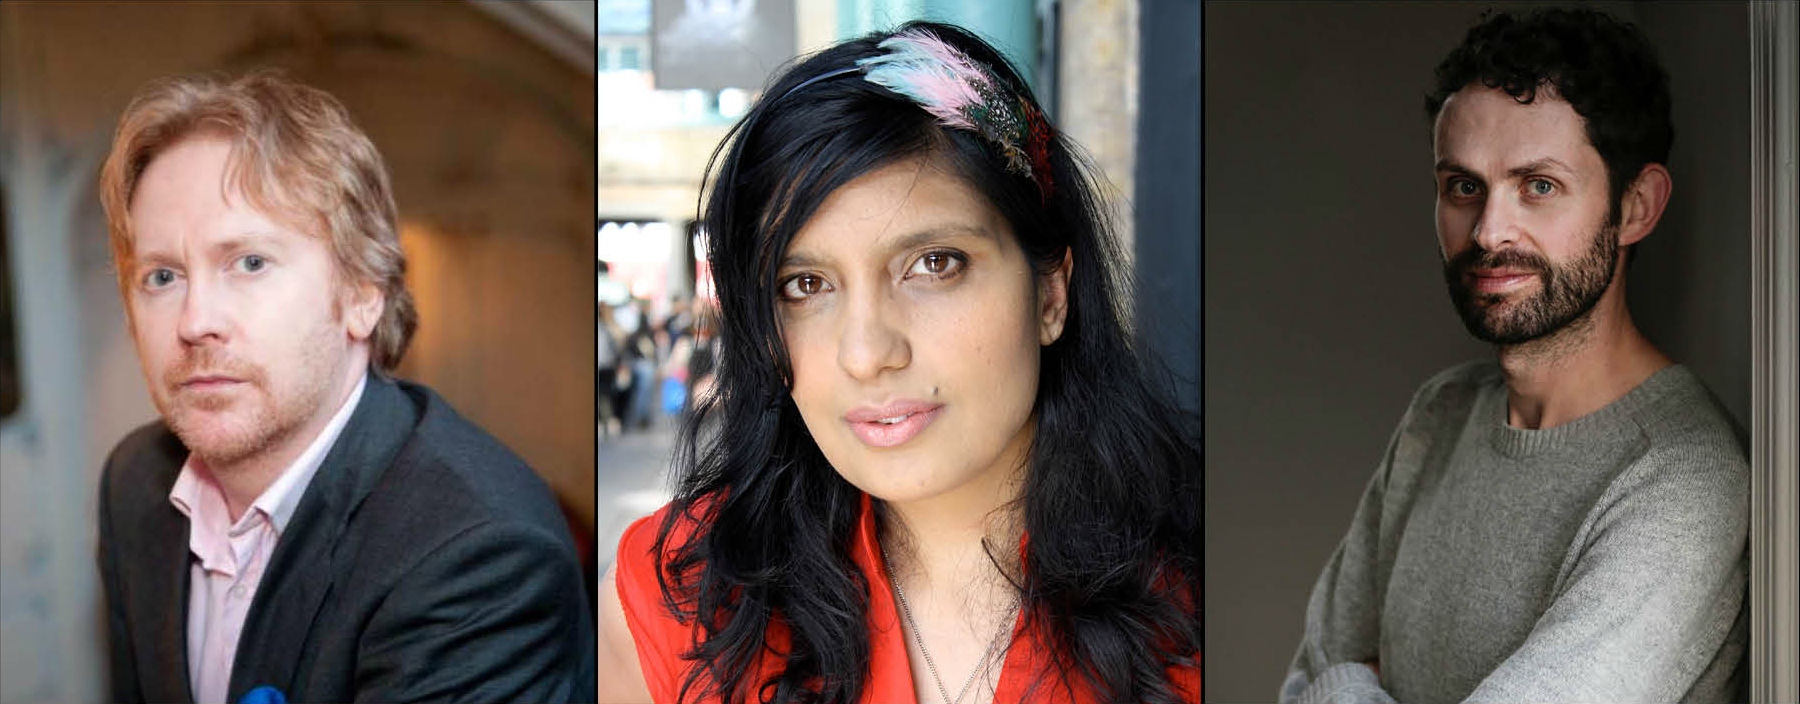 Rathbones Folio Prize 2020 Judges: Paul Farley, Nikita Lalwani, Ross Raisin